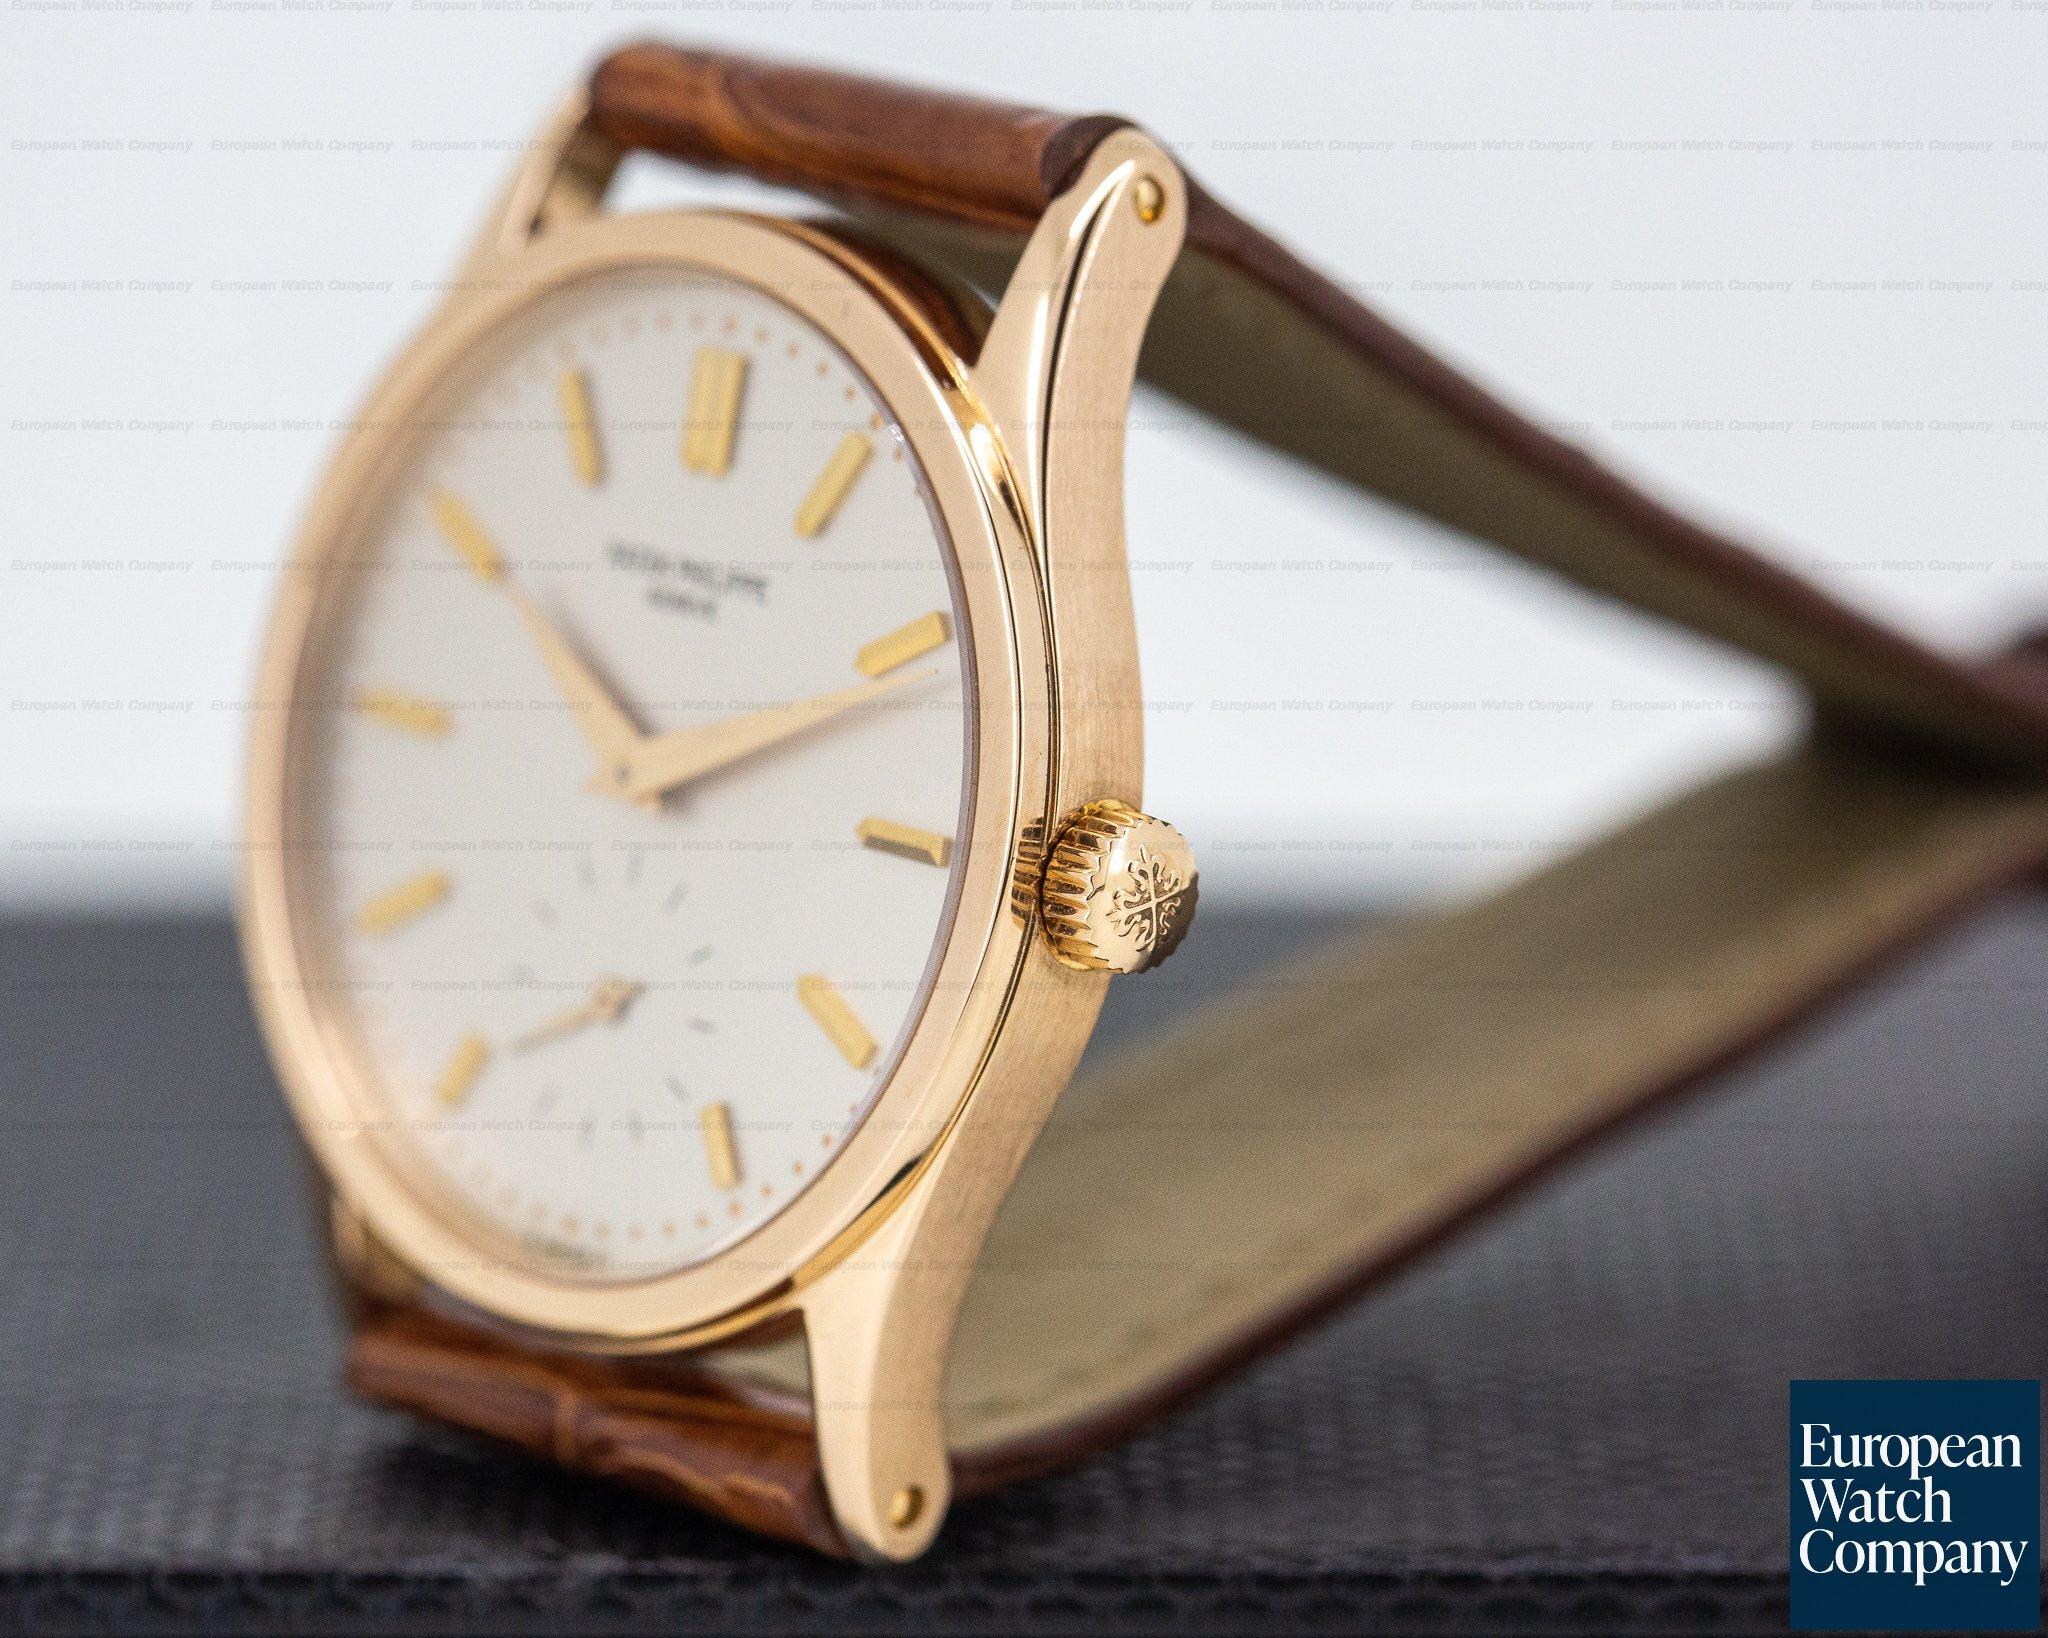 Patek Philippe 3796R-012 Calatrava Manual Wind 18K Rose Gold / Silver Dial